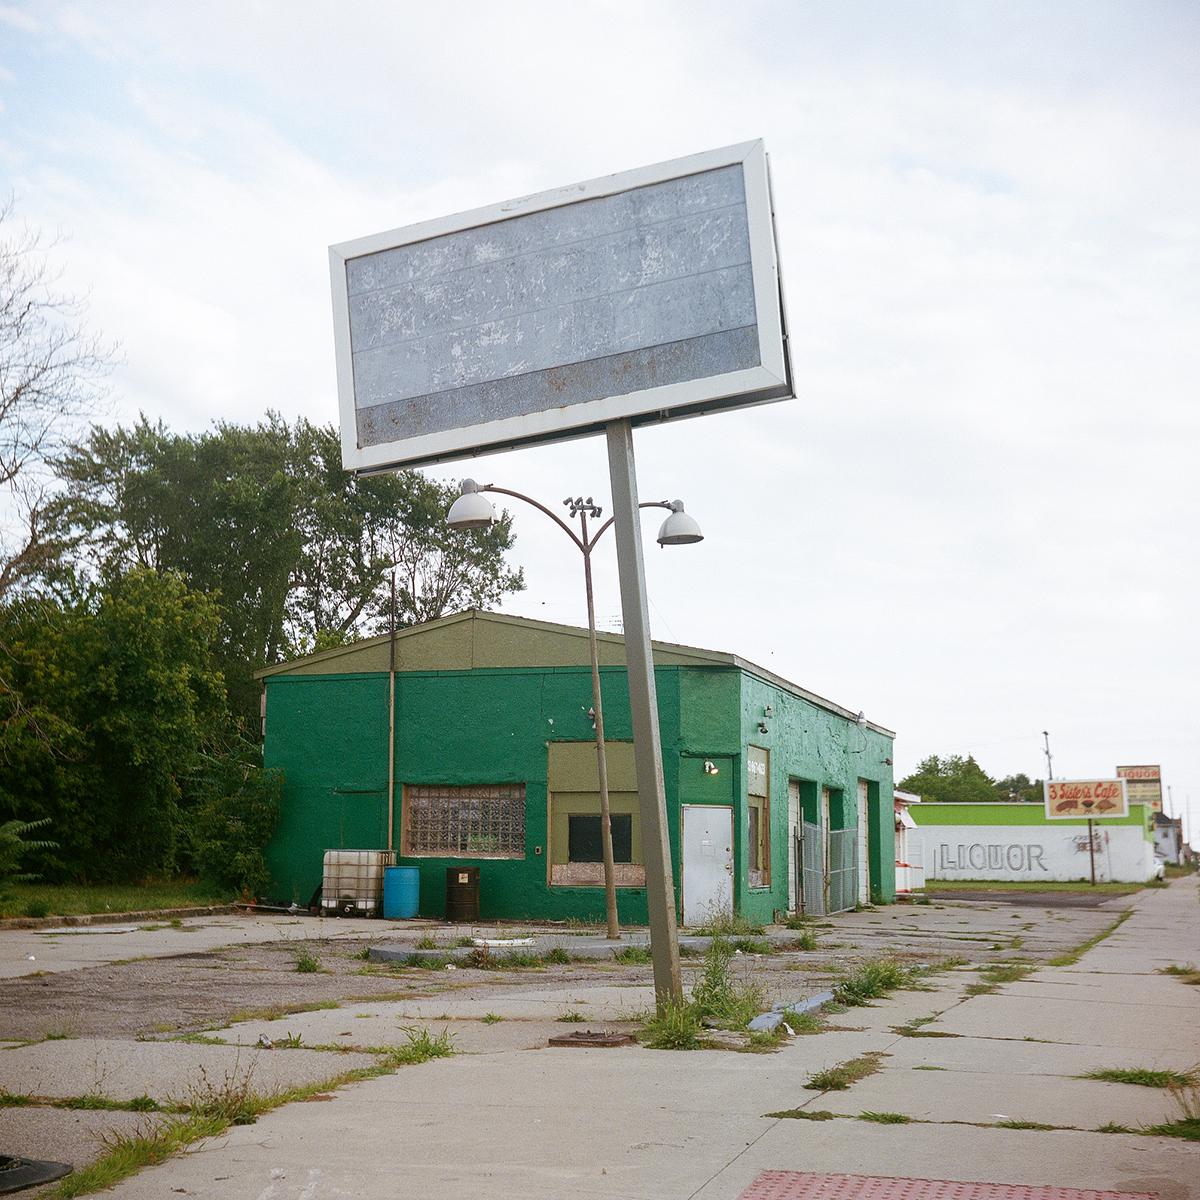 Gateway_Billboards-47.jpg